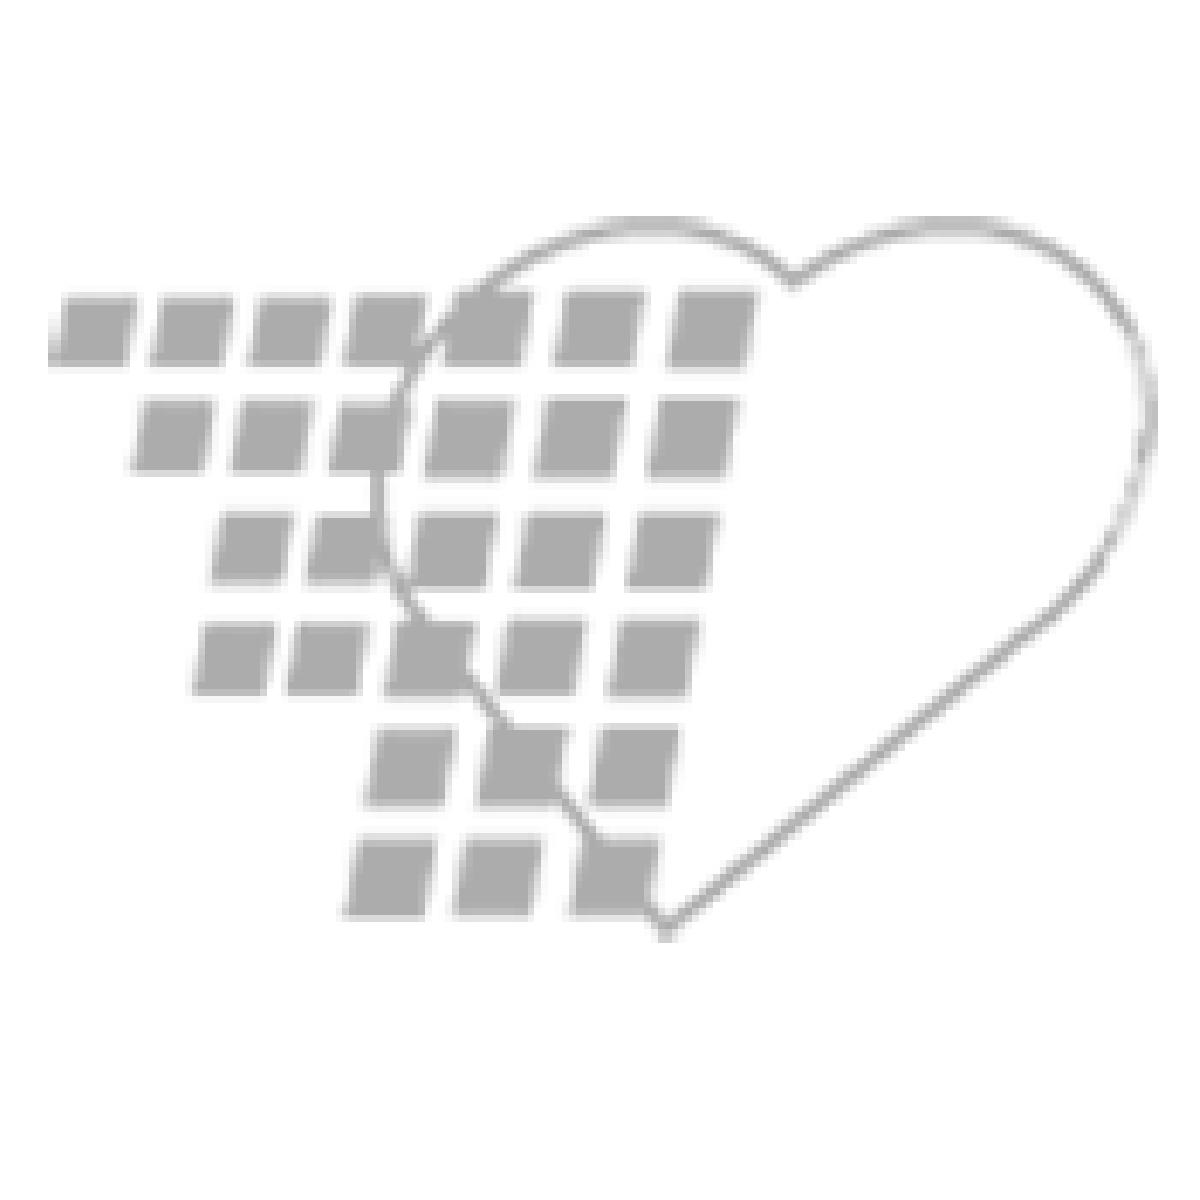 05-87-7100 Dover™ Universal Catheterization Tray - 10 mL Pre-filled Syringe